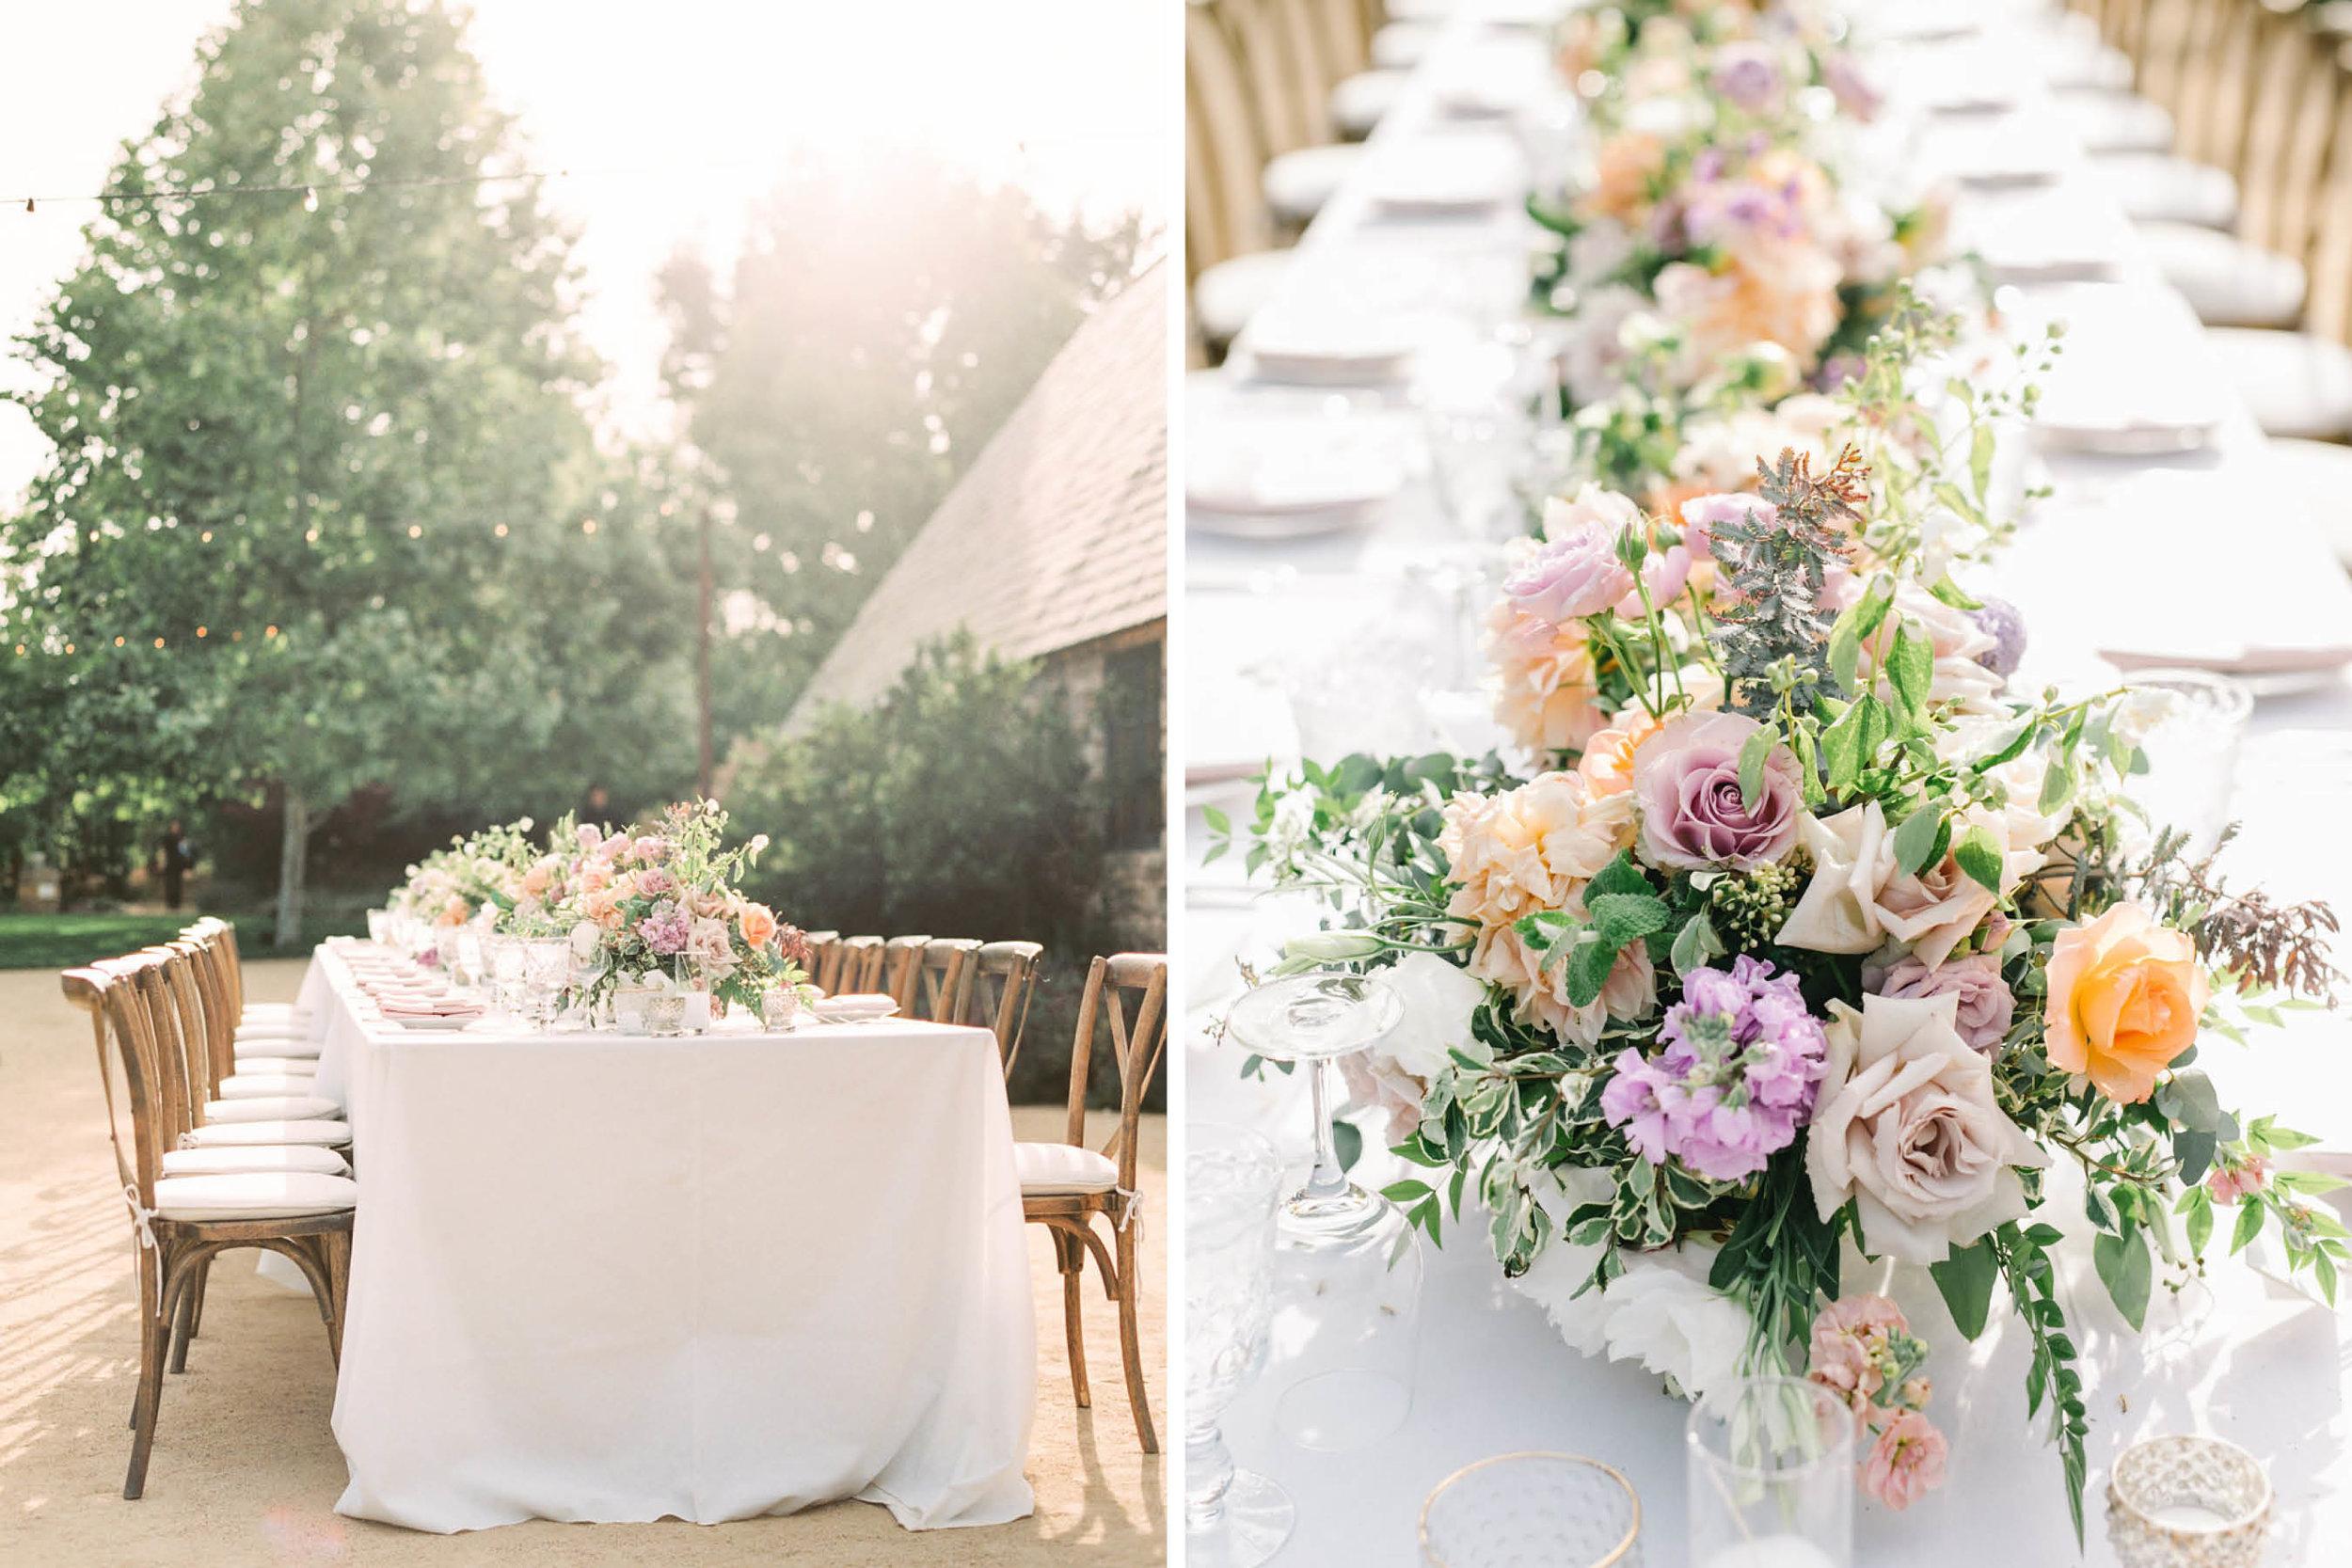 alegria-by-design-wedding-planner-planning-event-design-santa-barbara-day-of-coordinator-kestrel-park-santa-ynez-fields-castle-lavender-garden-mrs-box (41).jpg